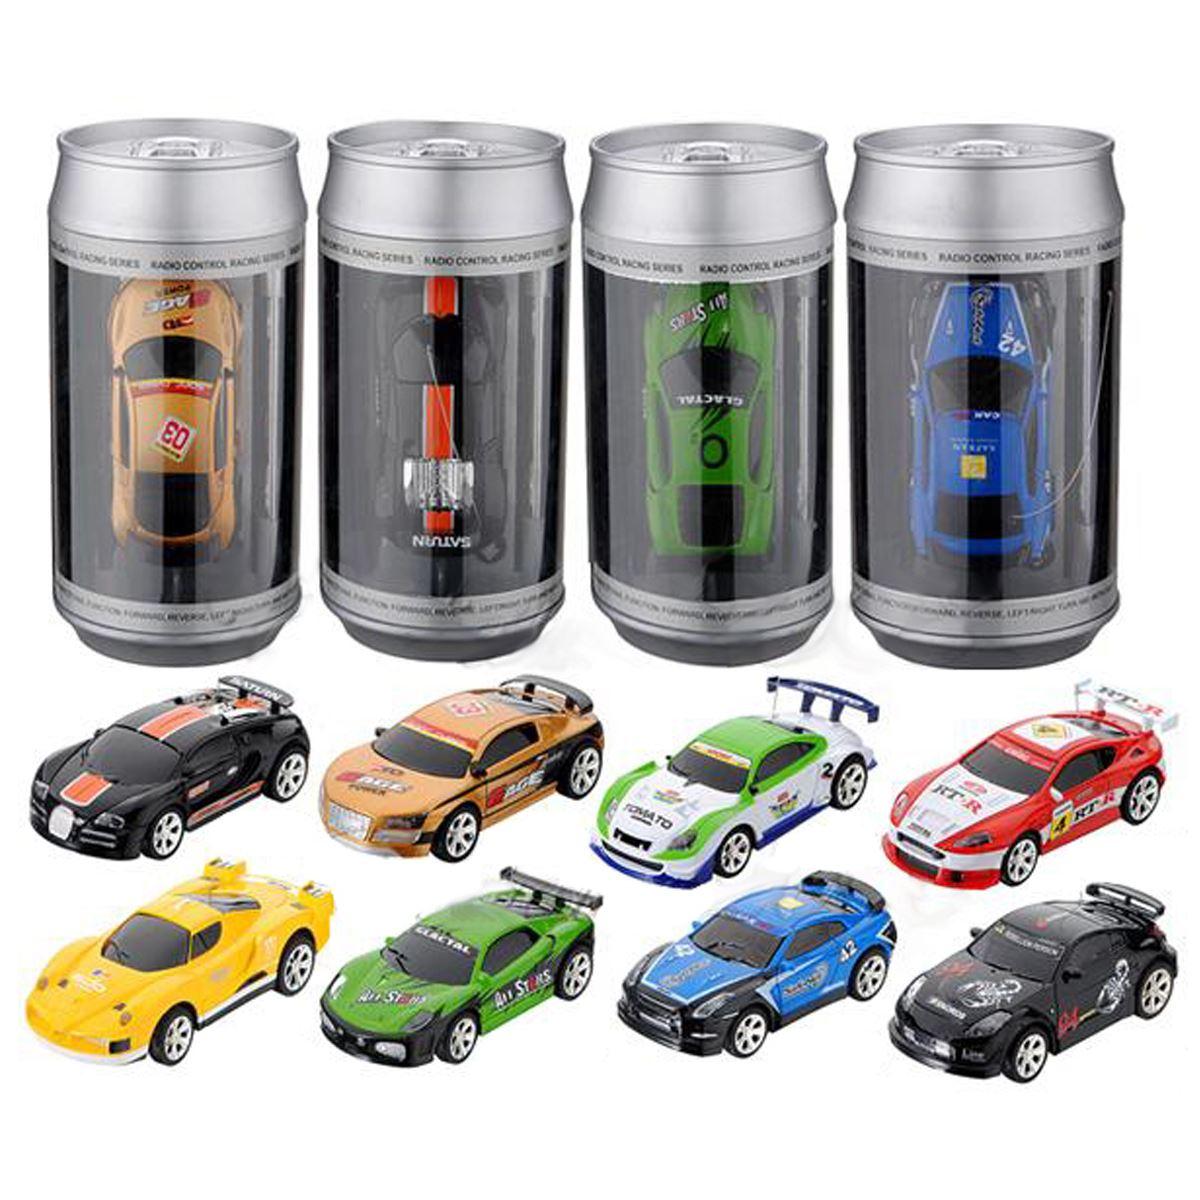 20KM/H Coke Can Mini RC Car Radio Remote Control Micro Racing Car 4 Frequencies(China (Mainland))